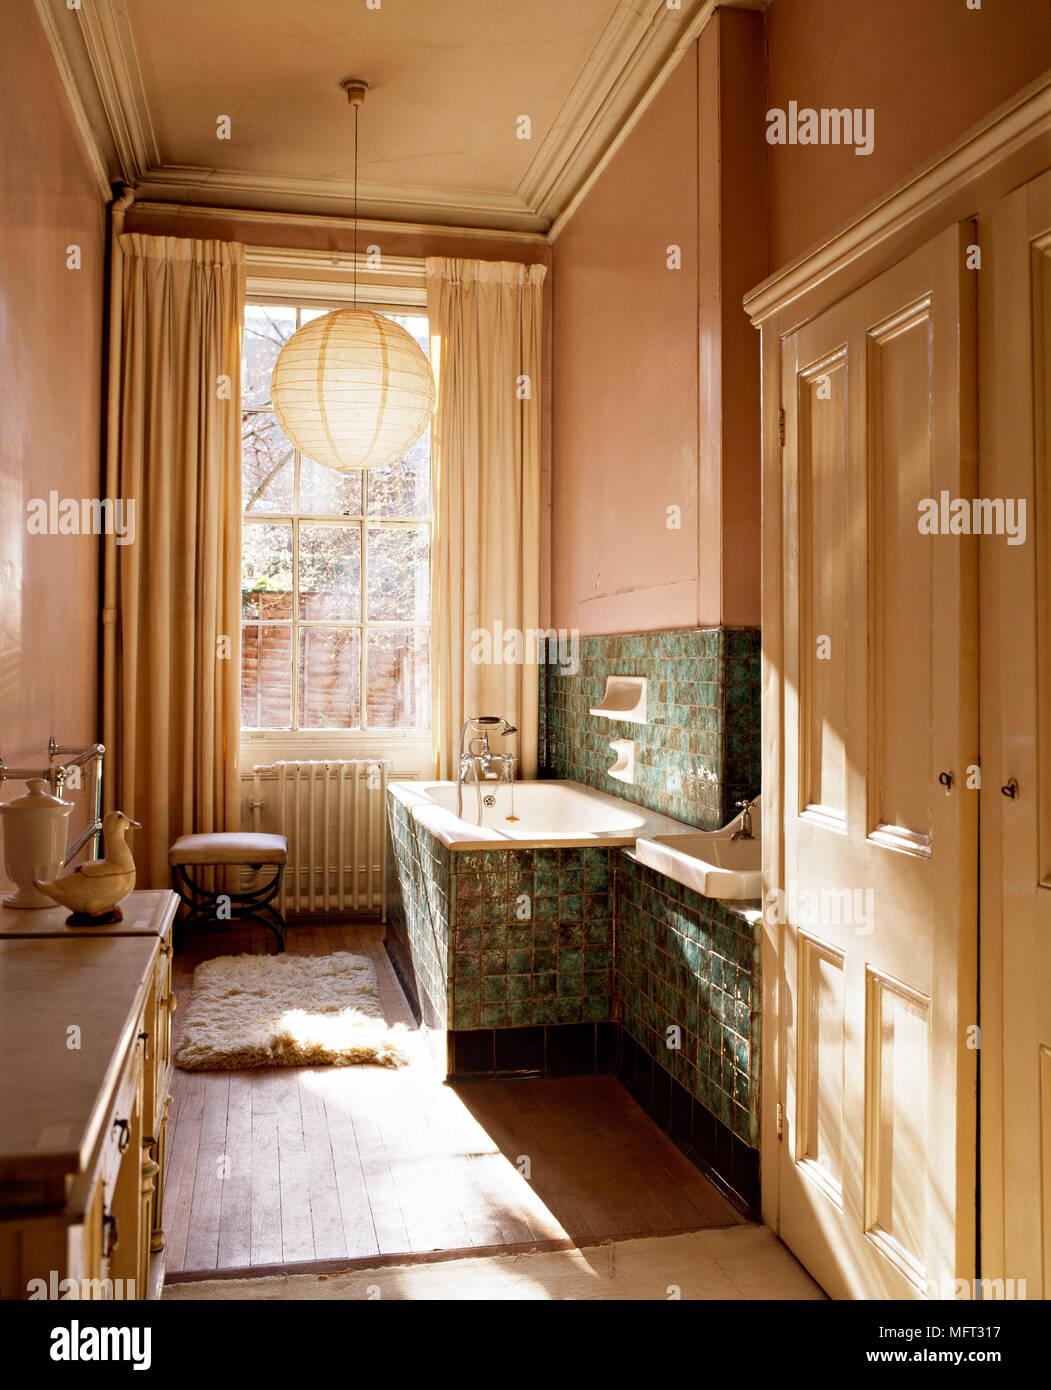 Interiors Bathrooms Curtains Stockfotos  Interiors Bathrooms Curtains Bilder  Alamy